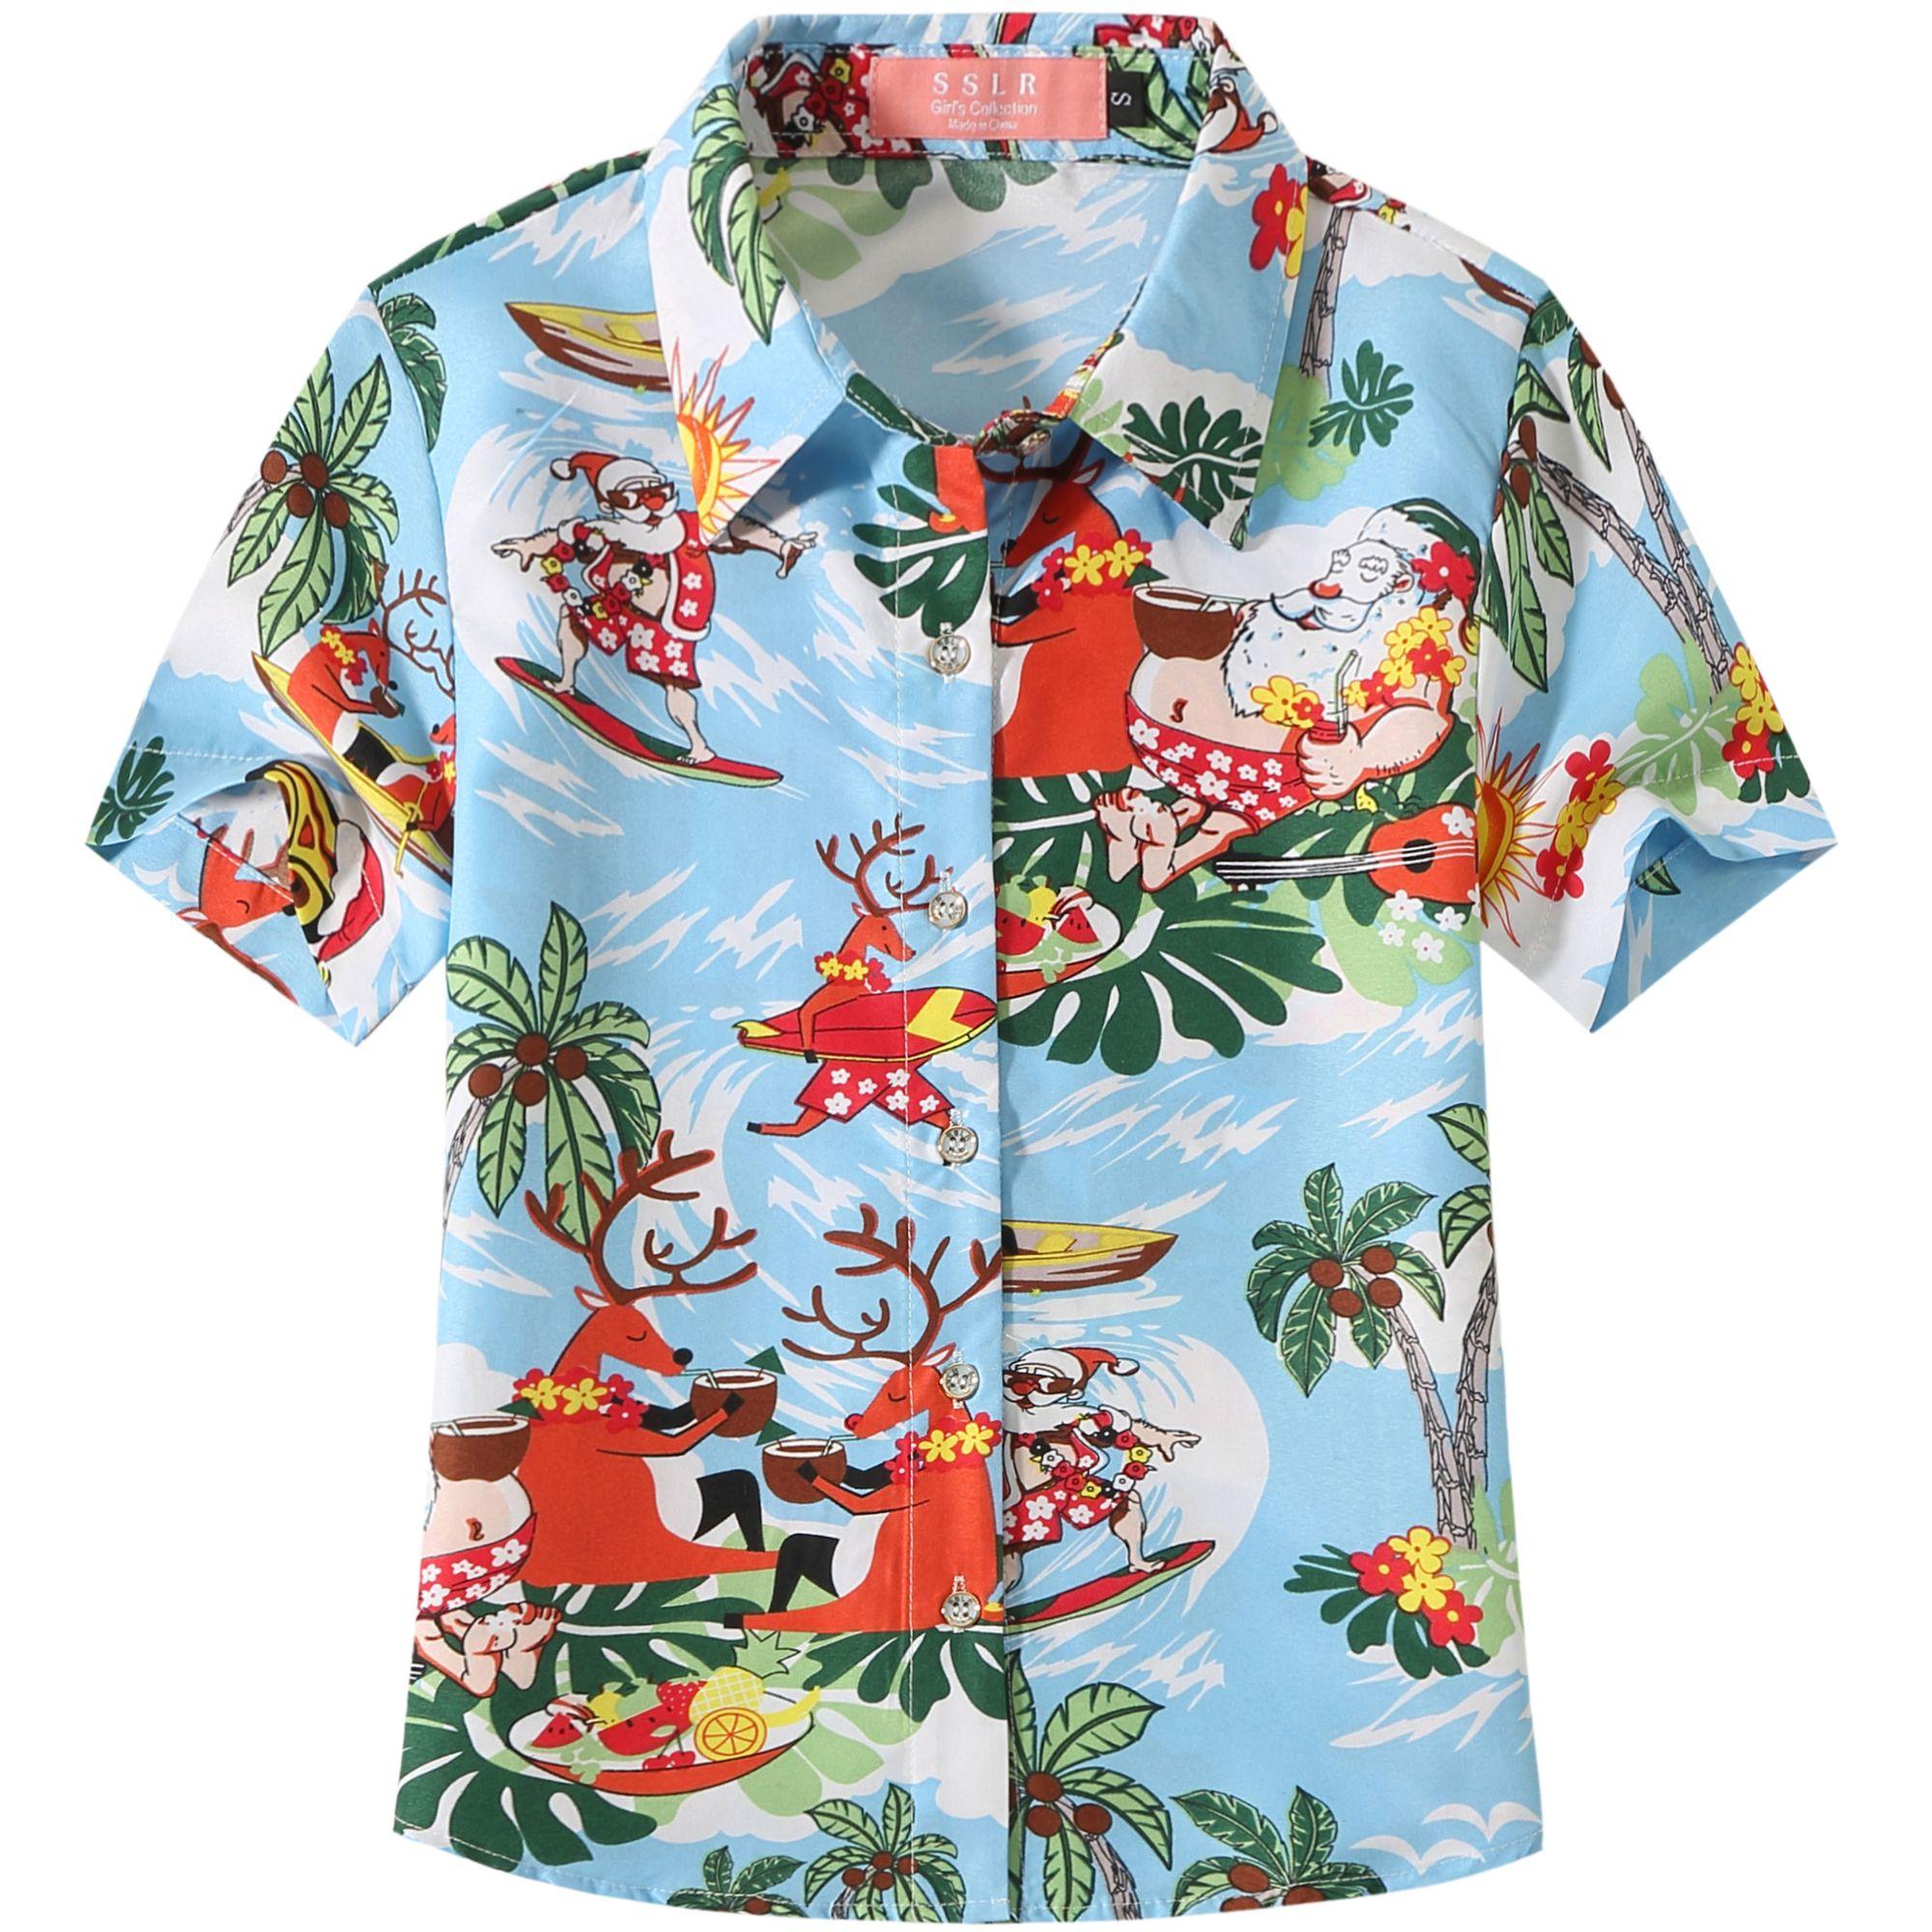 90f2a007 Girl's Tropical Holiday Party Hawaiian Christmas Shirts #christmas #tropical  #hawaiian #shirts